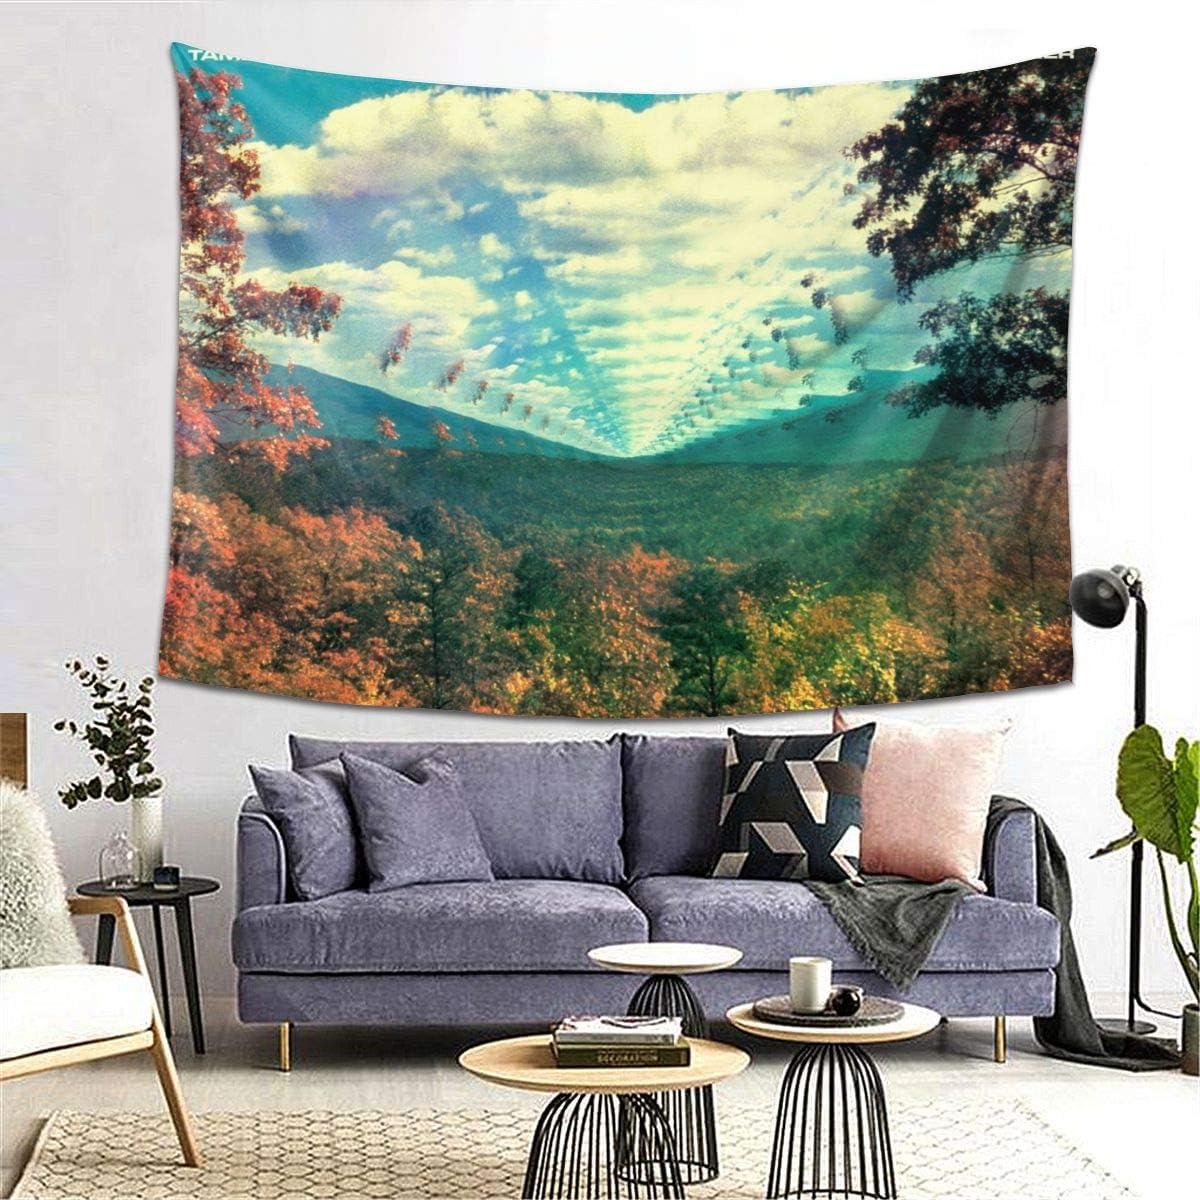 MariaDMiller Tame Impala InnerSpeaker Tapestry,Multi-Purpose Tapestry,Suitable for Living Room Bedroom,Tapestries